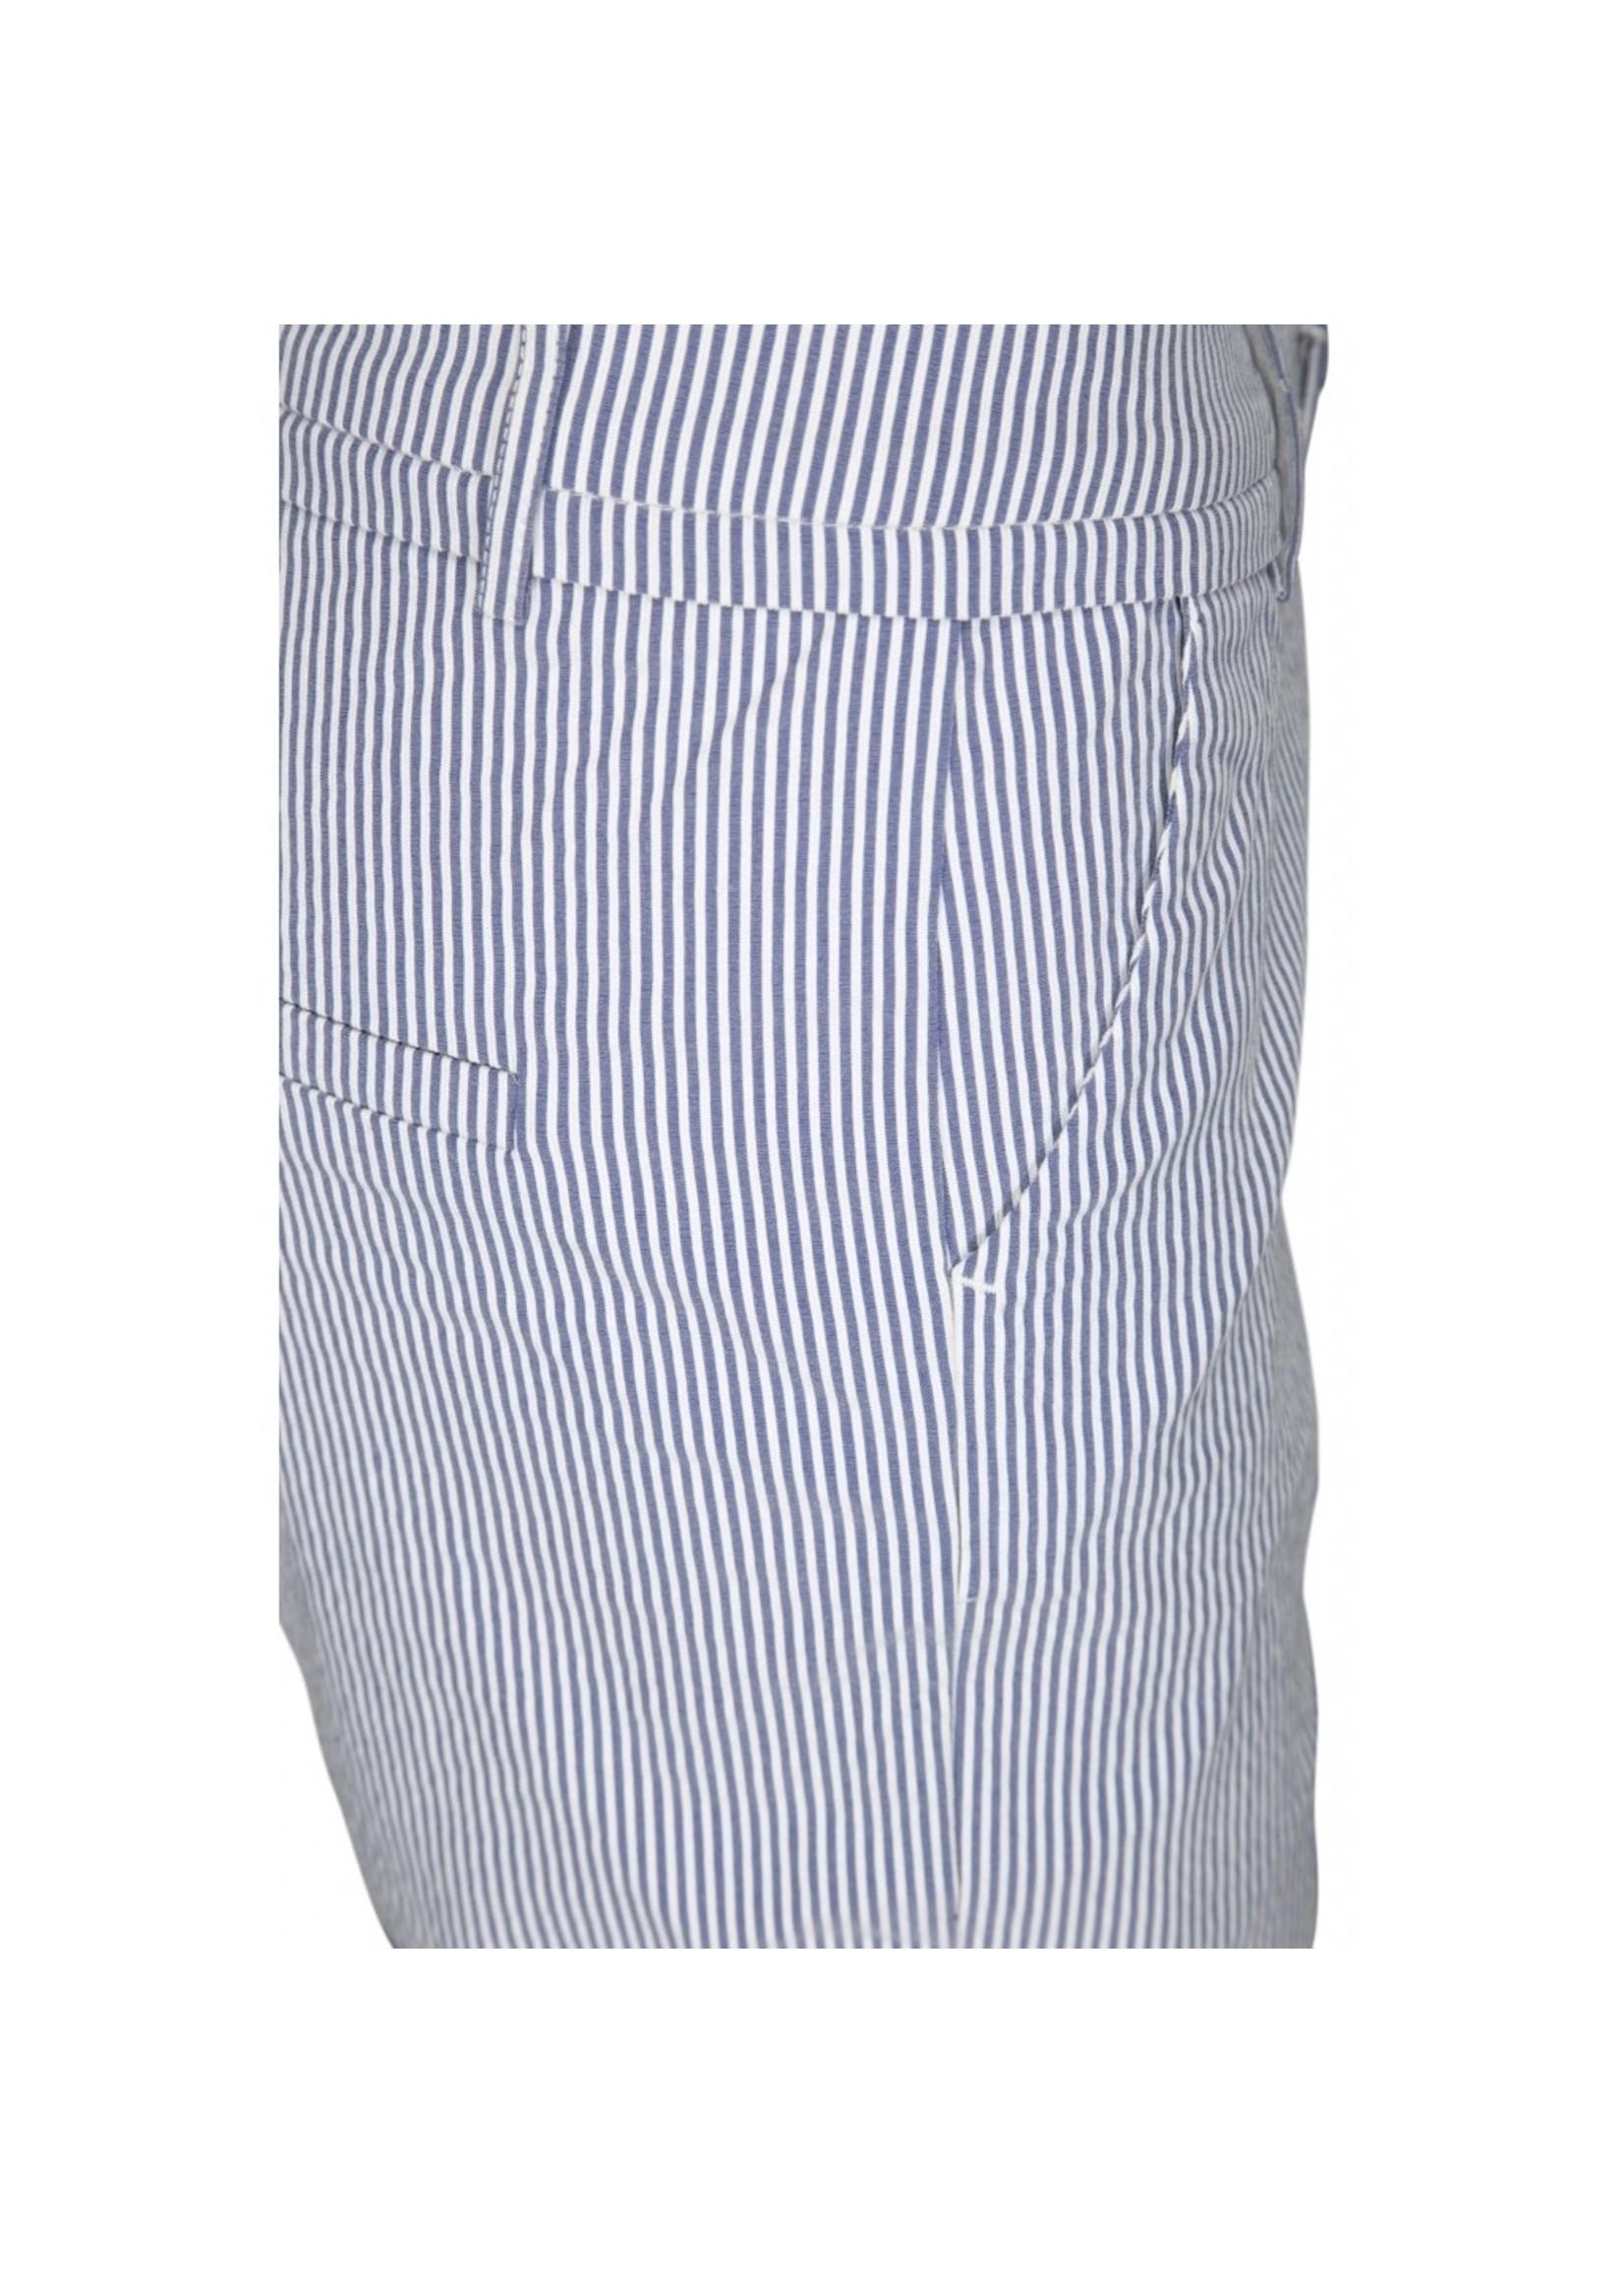 MINUS New Carma check 7/8 pants stripe